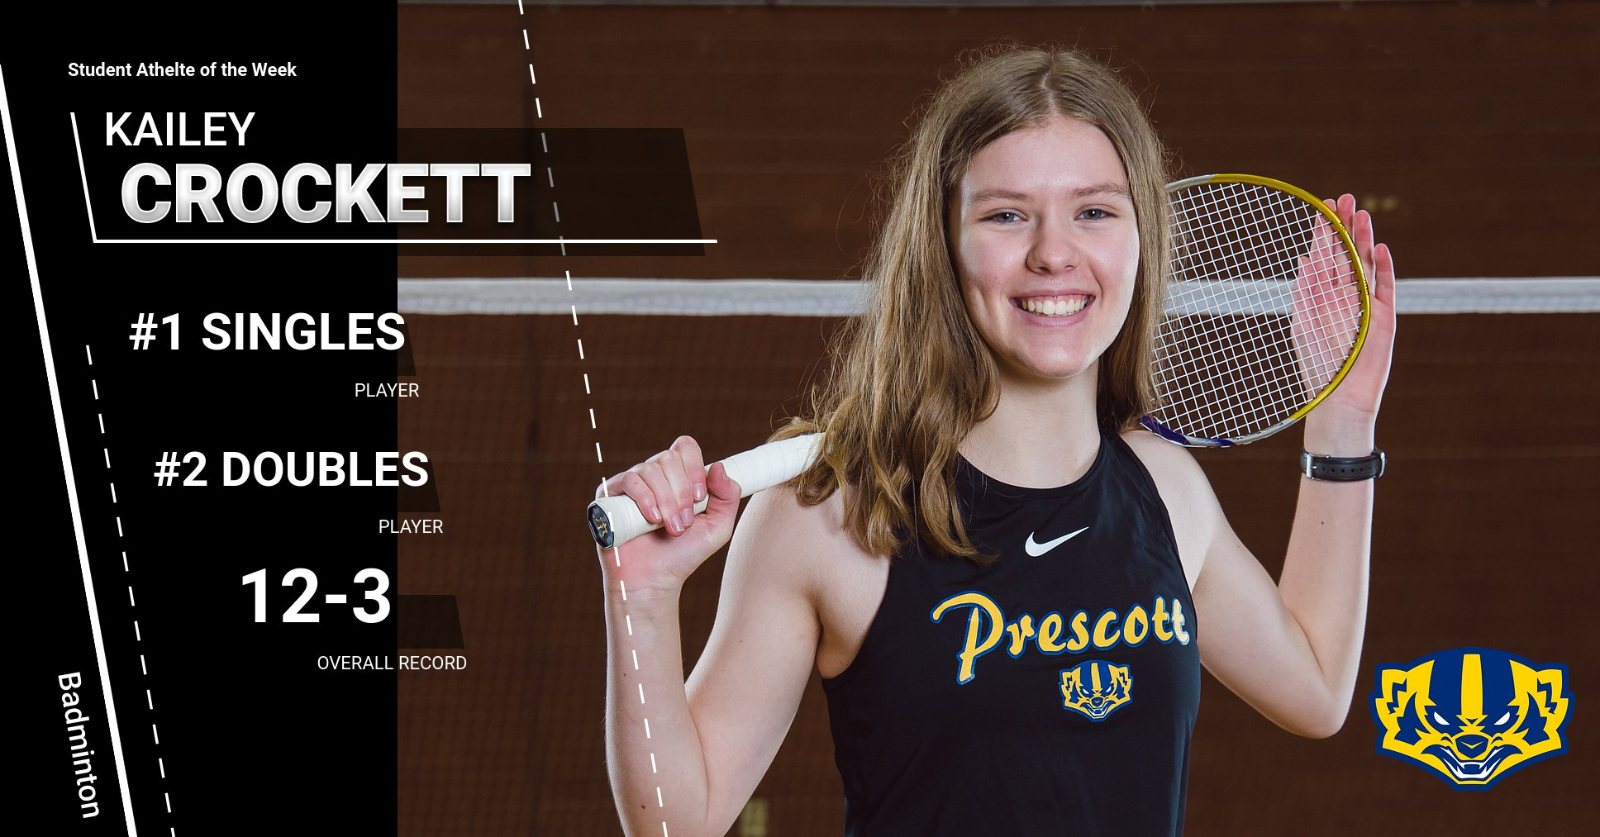 Student Athlete of the Week-Kailey Crockett (Badminton)